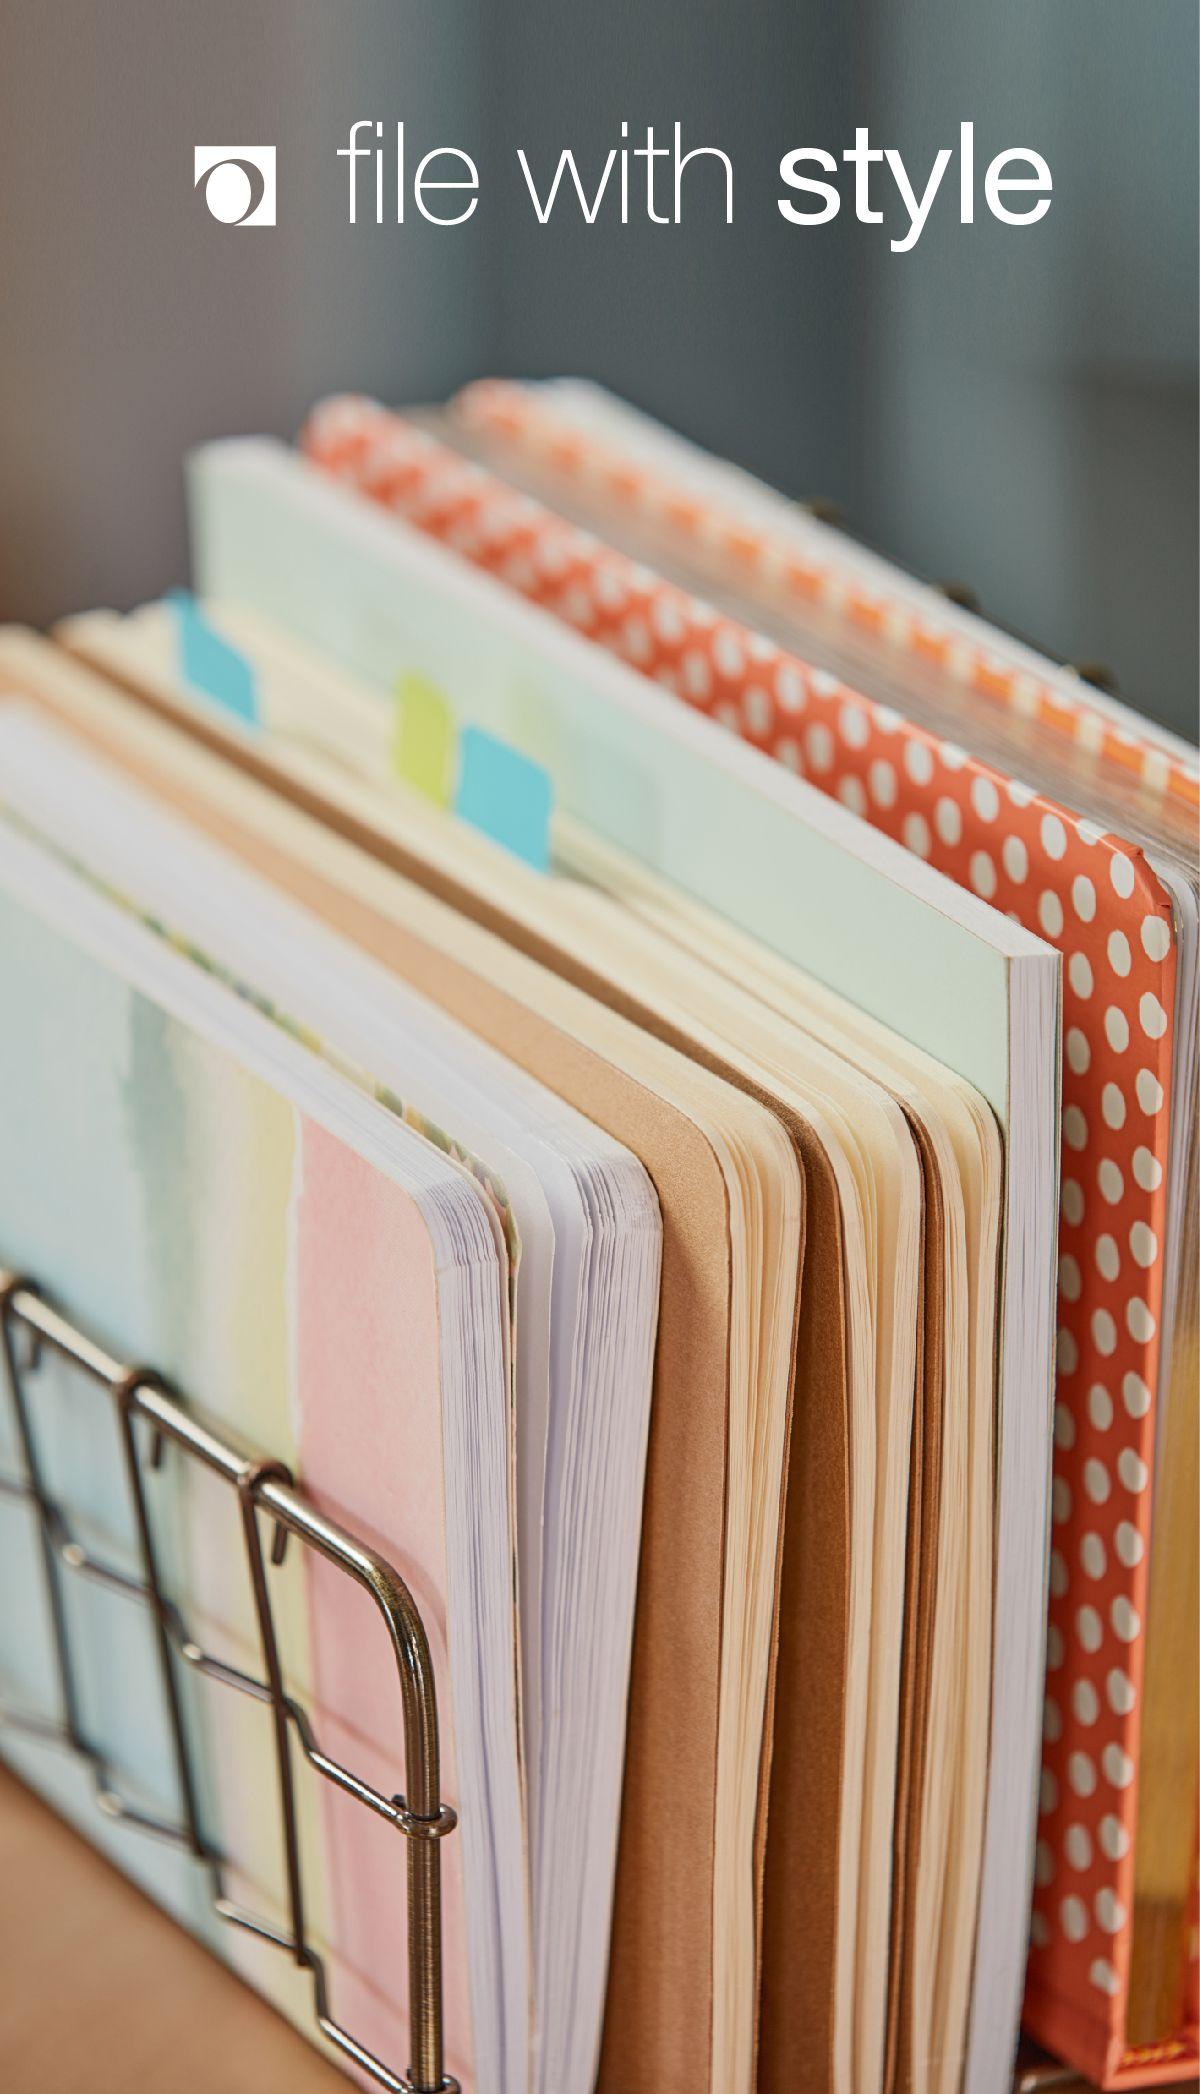 14 Genius Home Office Organization Ideas Overstock Com Home Office Organization Office Organization Organization